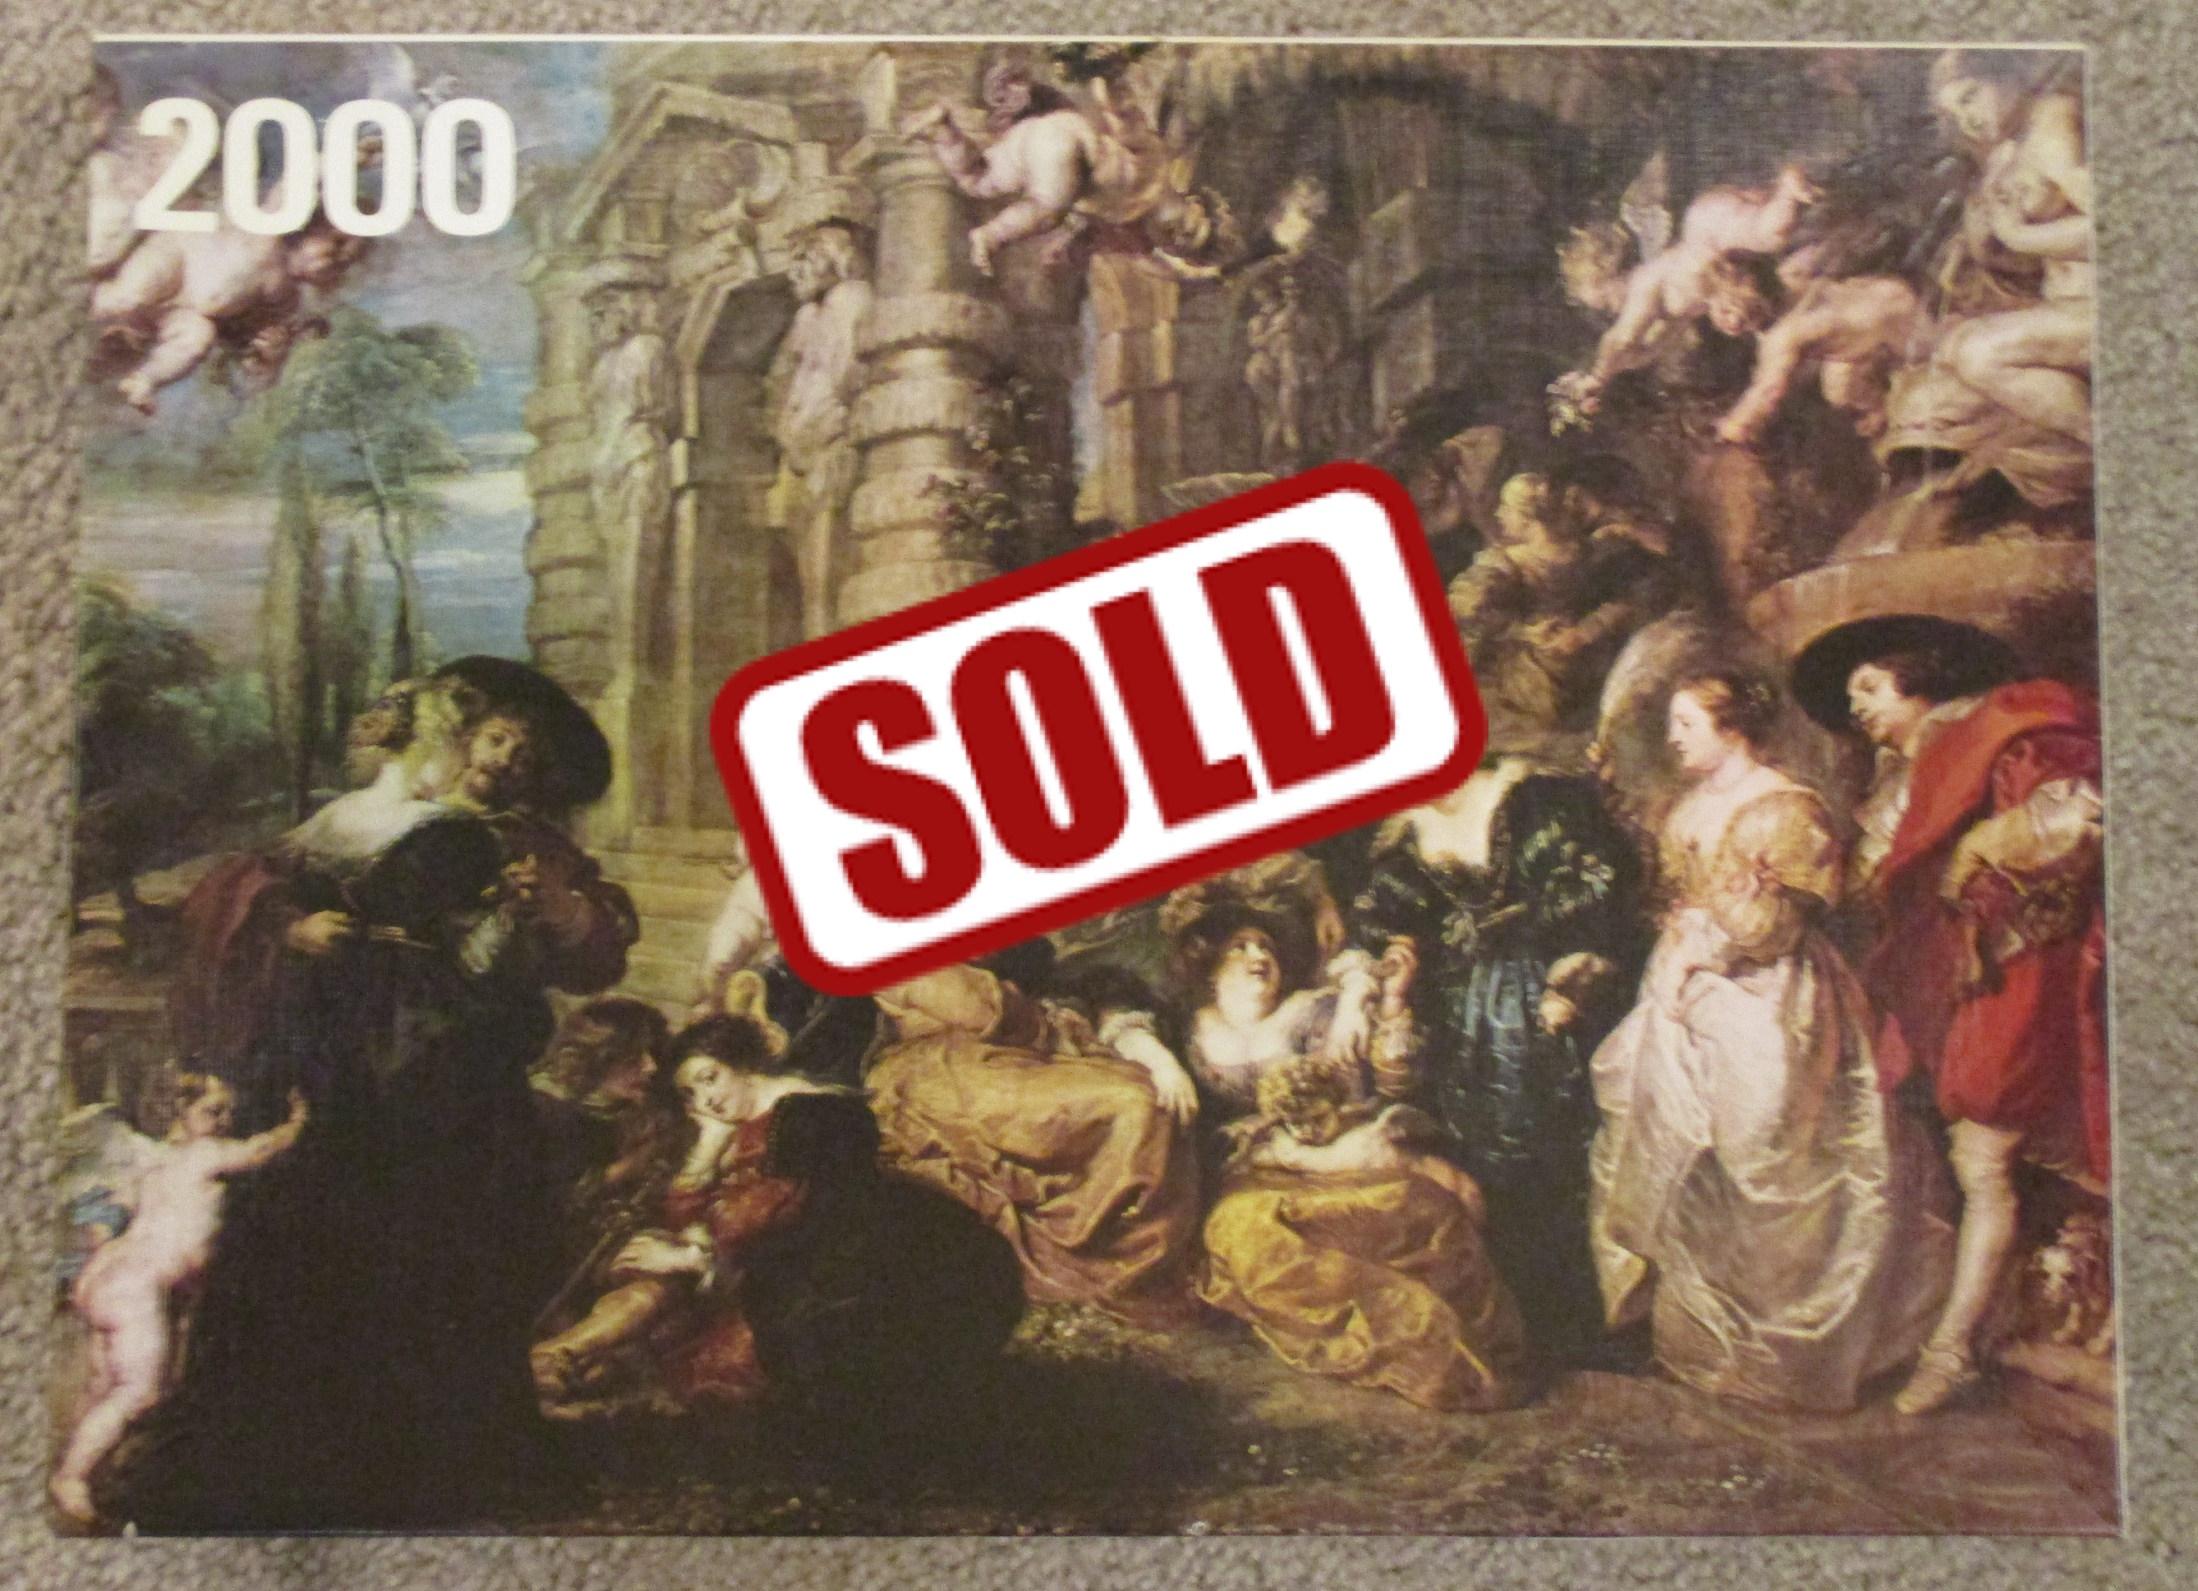 2000, Hestair, Garden of Love, Peter Paul Rubens - Rare Puzzles